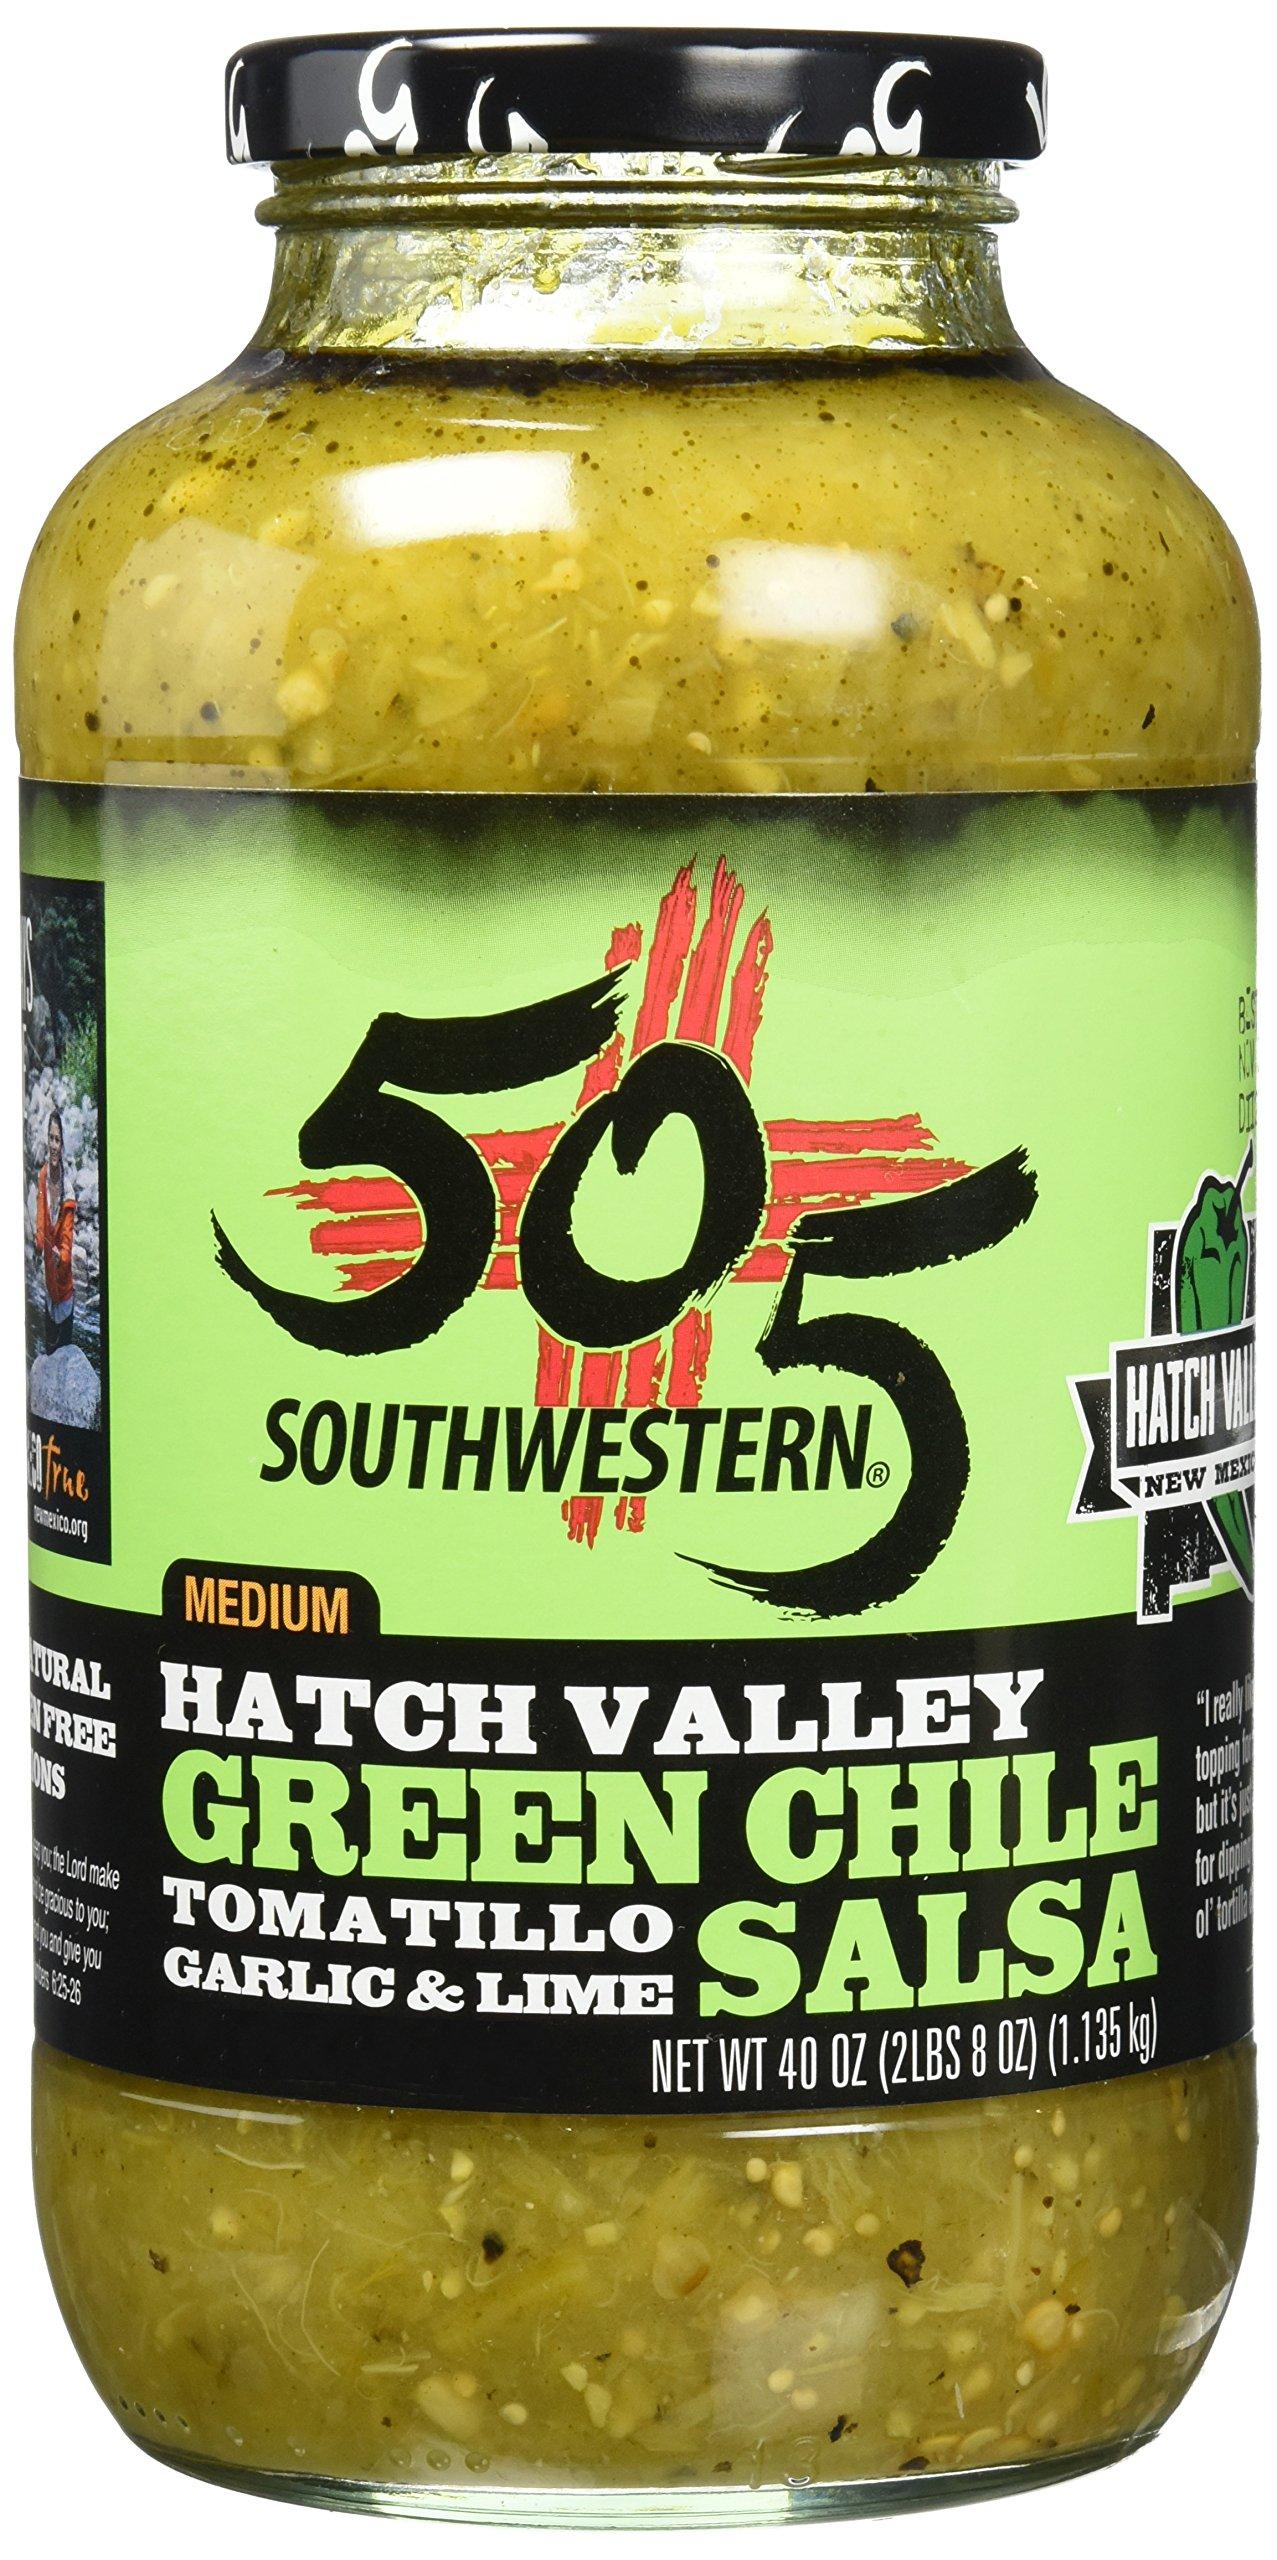 505 Southwestern Hatch Valley Green Chile Salsa 40 Oz by 505 Southwestern